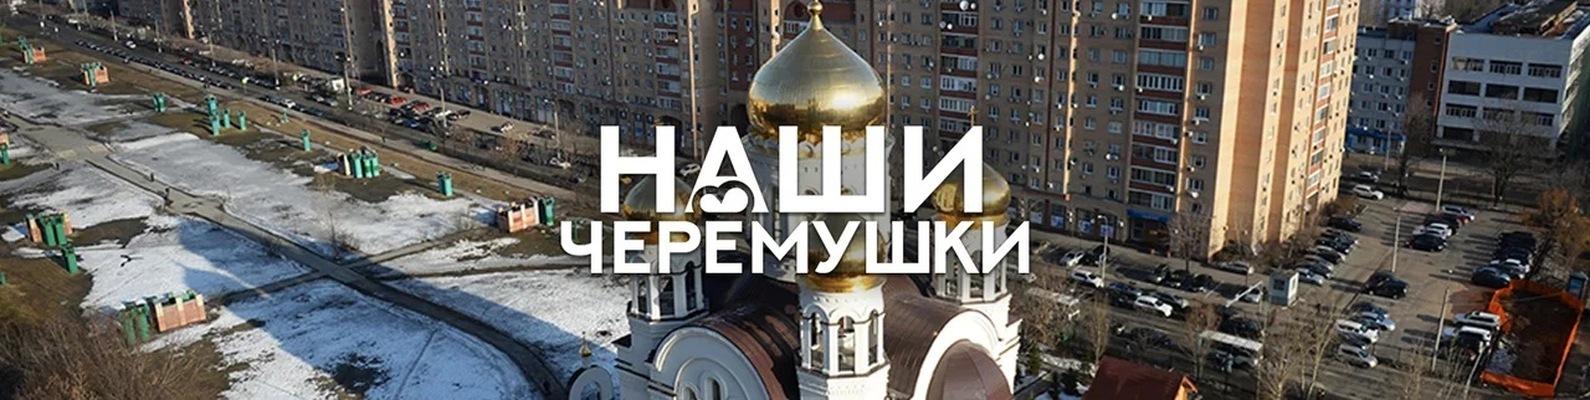 Наши Черемушки сидят дома / Москва | ВКонтакте